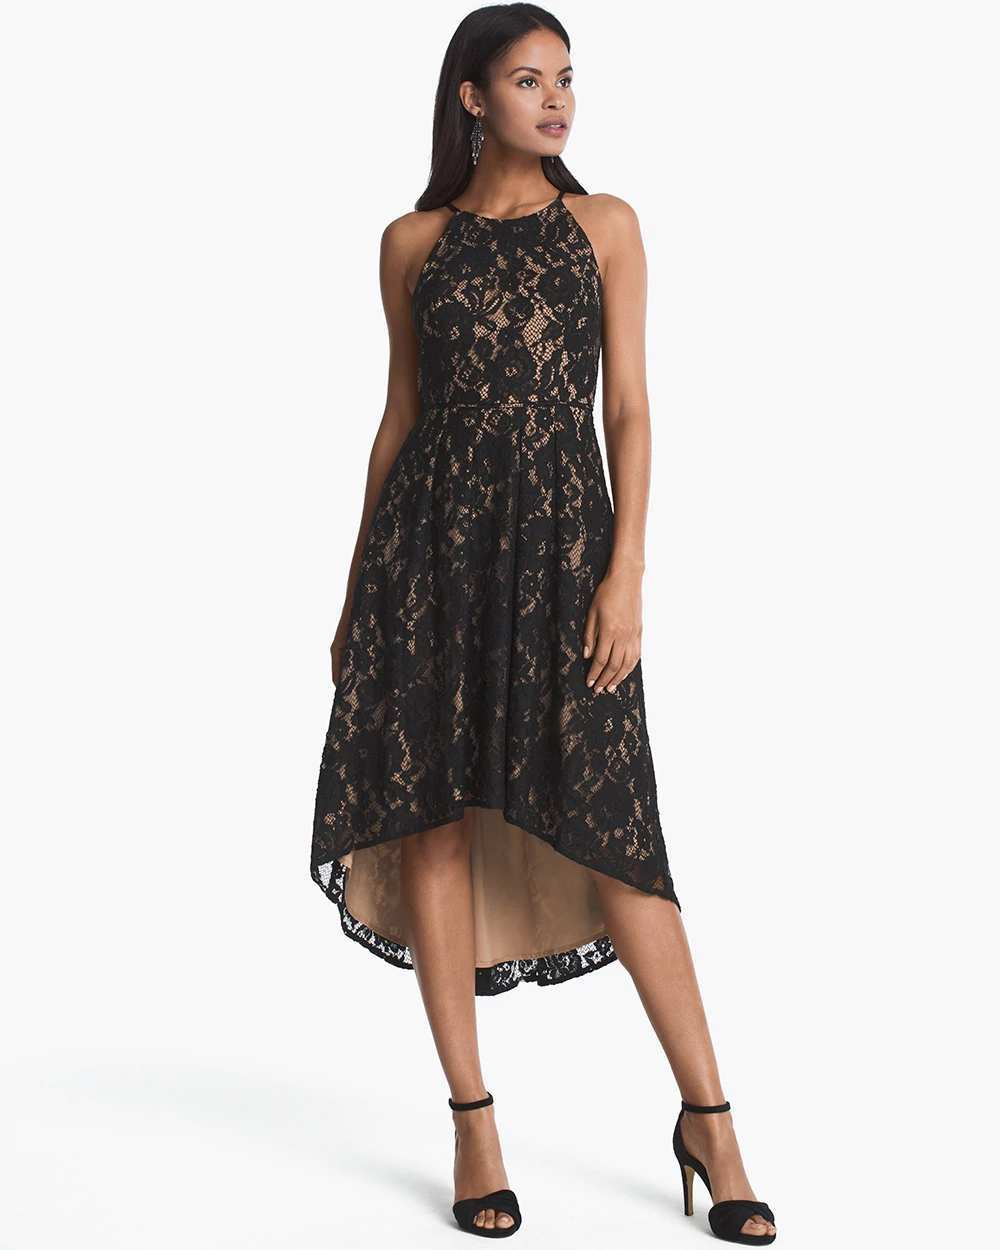 SLEEVELESS LACE HIGH-LOW DRESS   Hermosaz